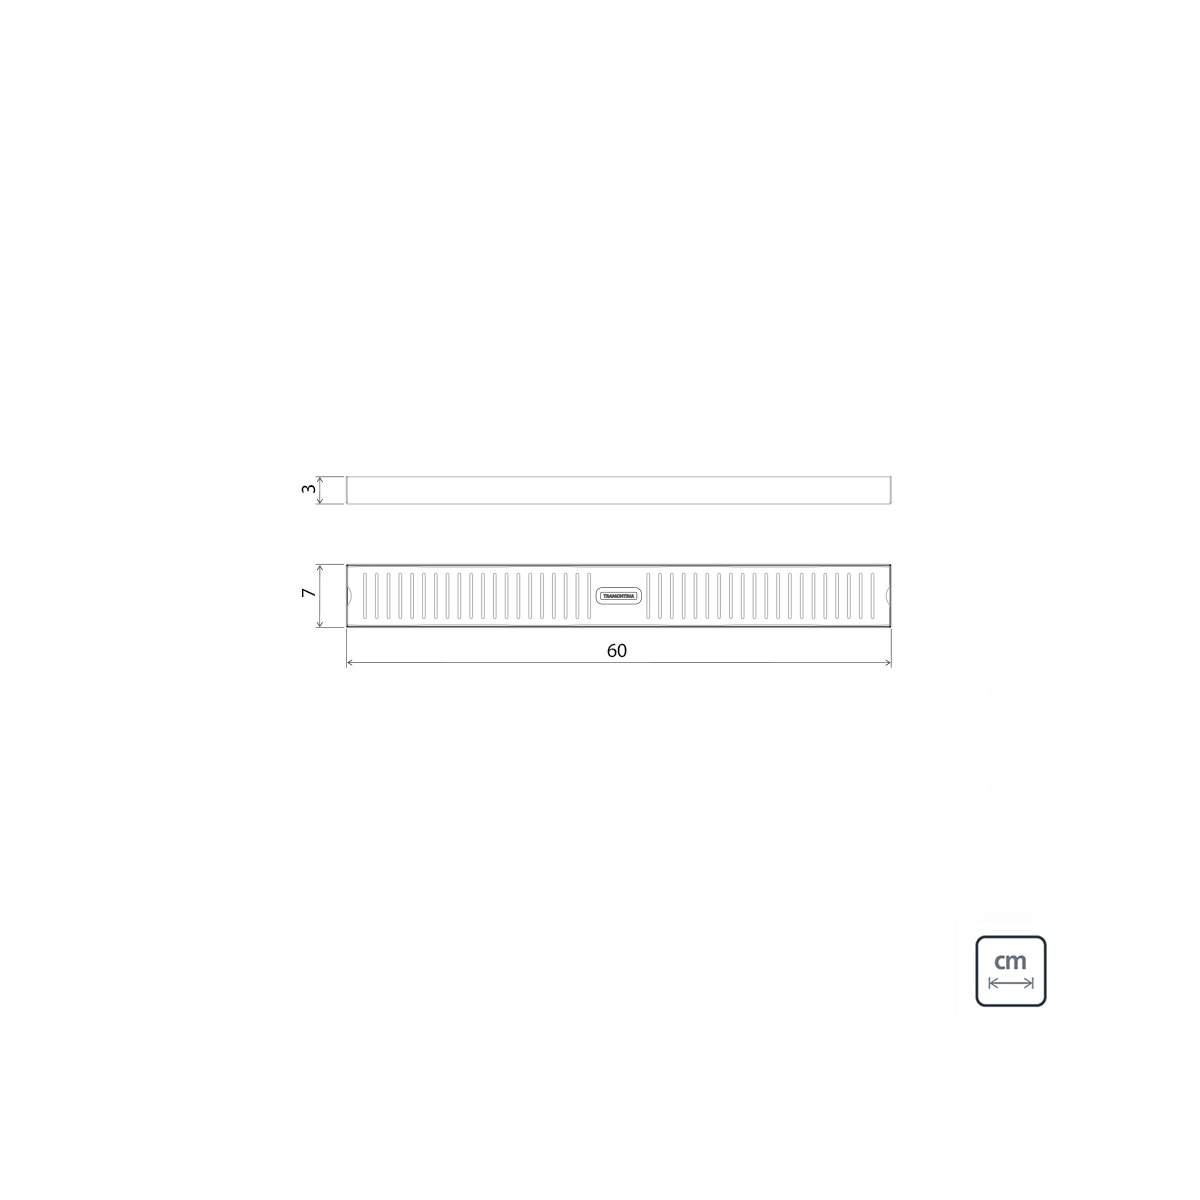 Ralo Slim Tramontina em Aço Inox 60 x 7 cm